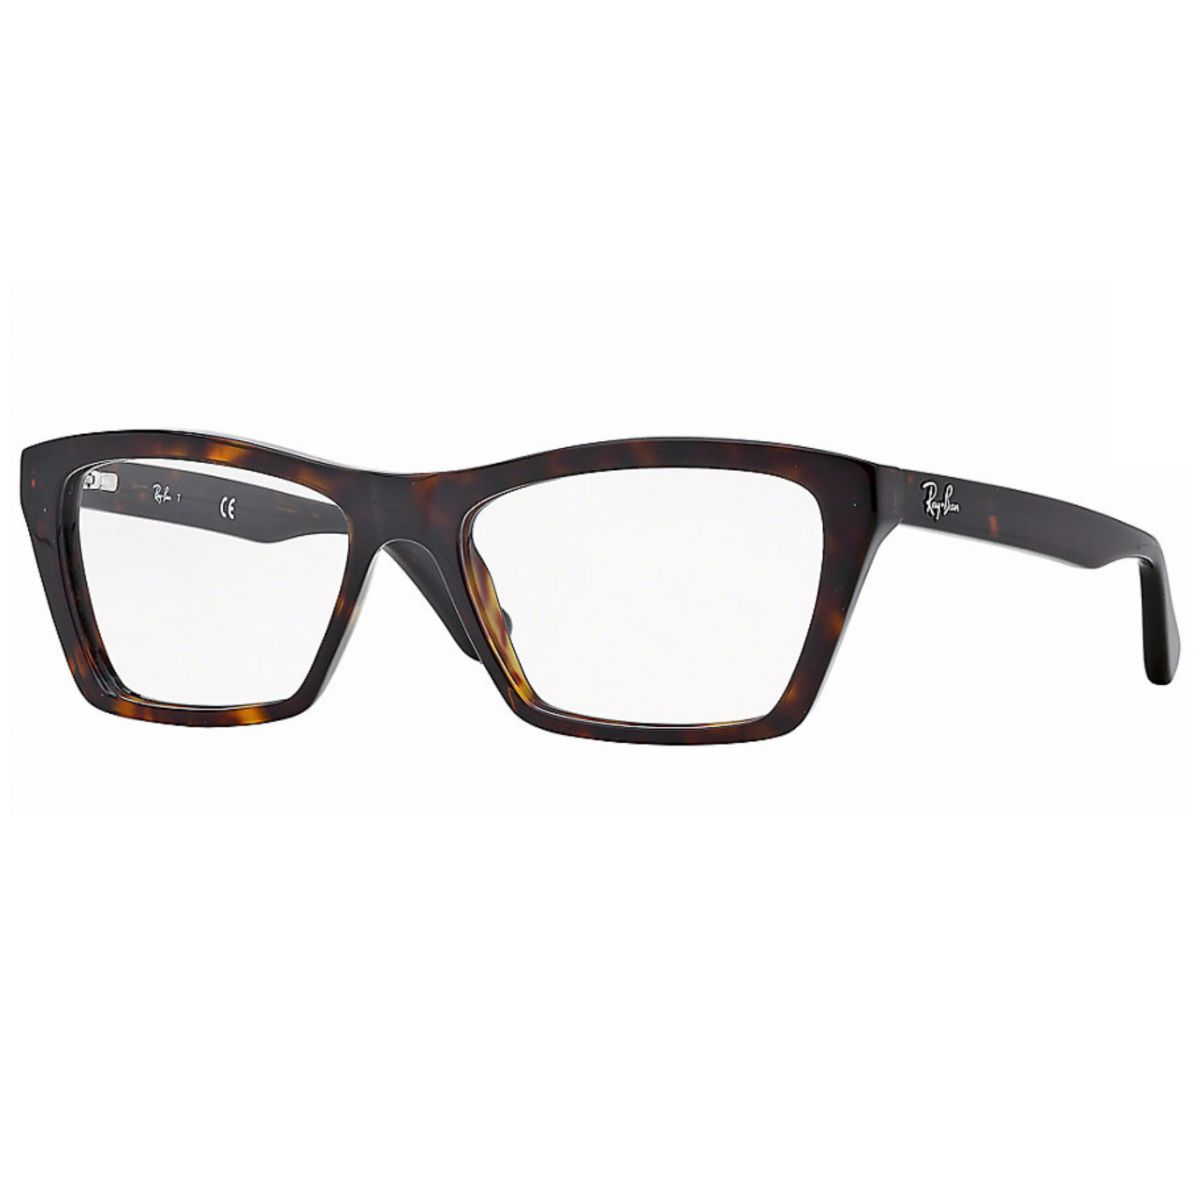 Óculos De Grau Ray Ban Feminino RB5316 2012 Tam.53